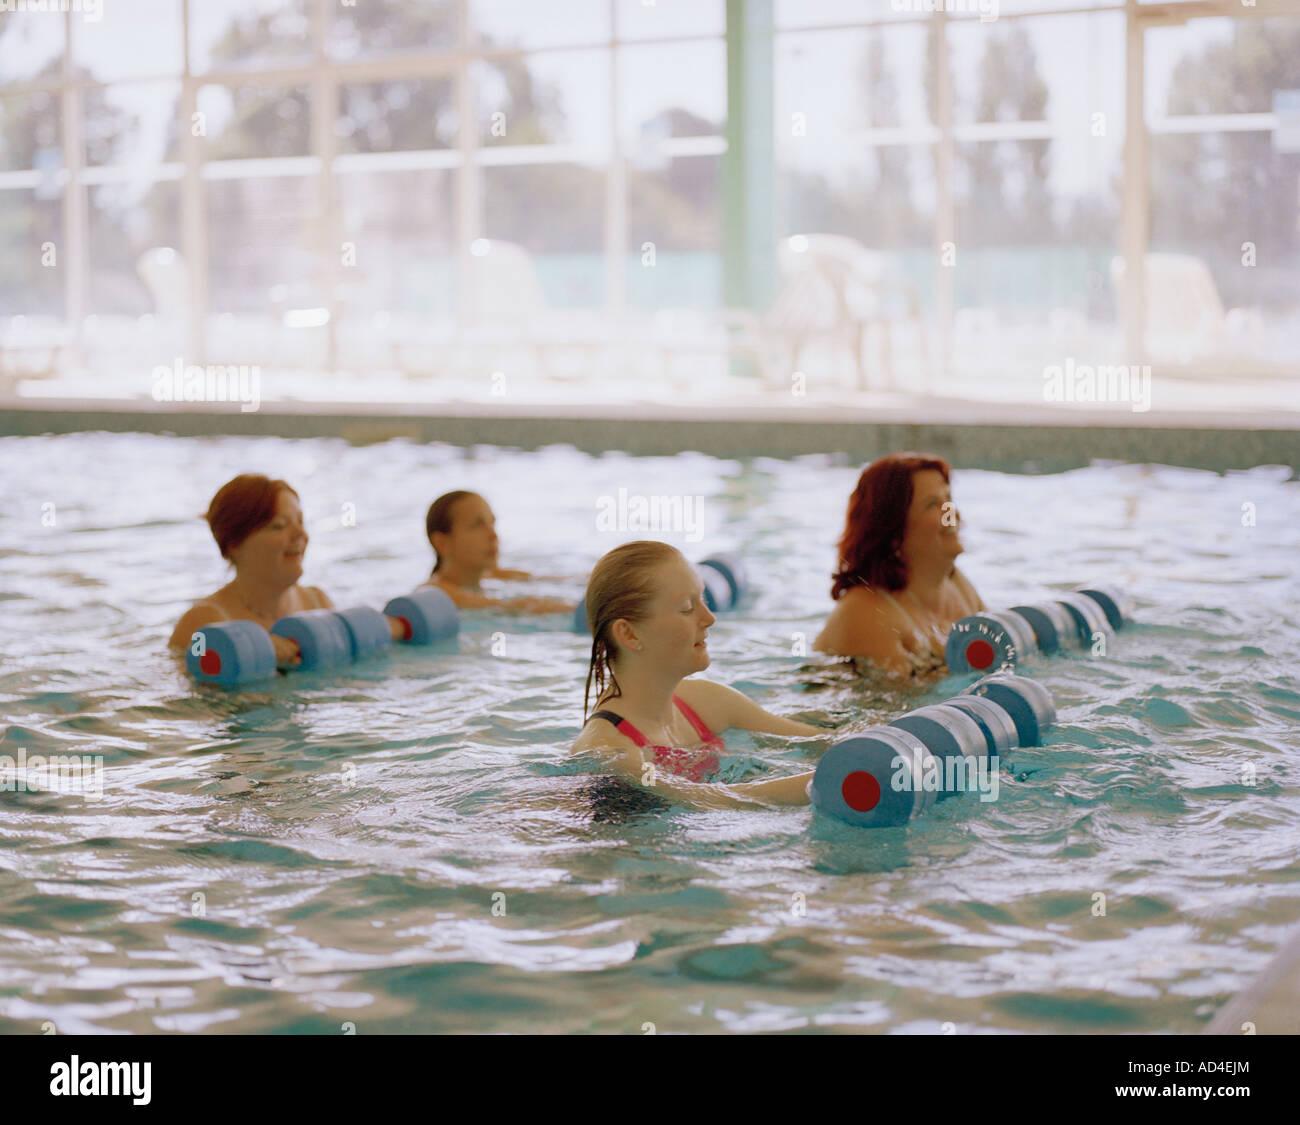 Women doing a water aerobics class - Stock Image